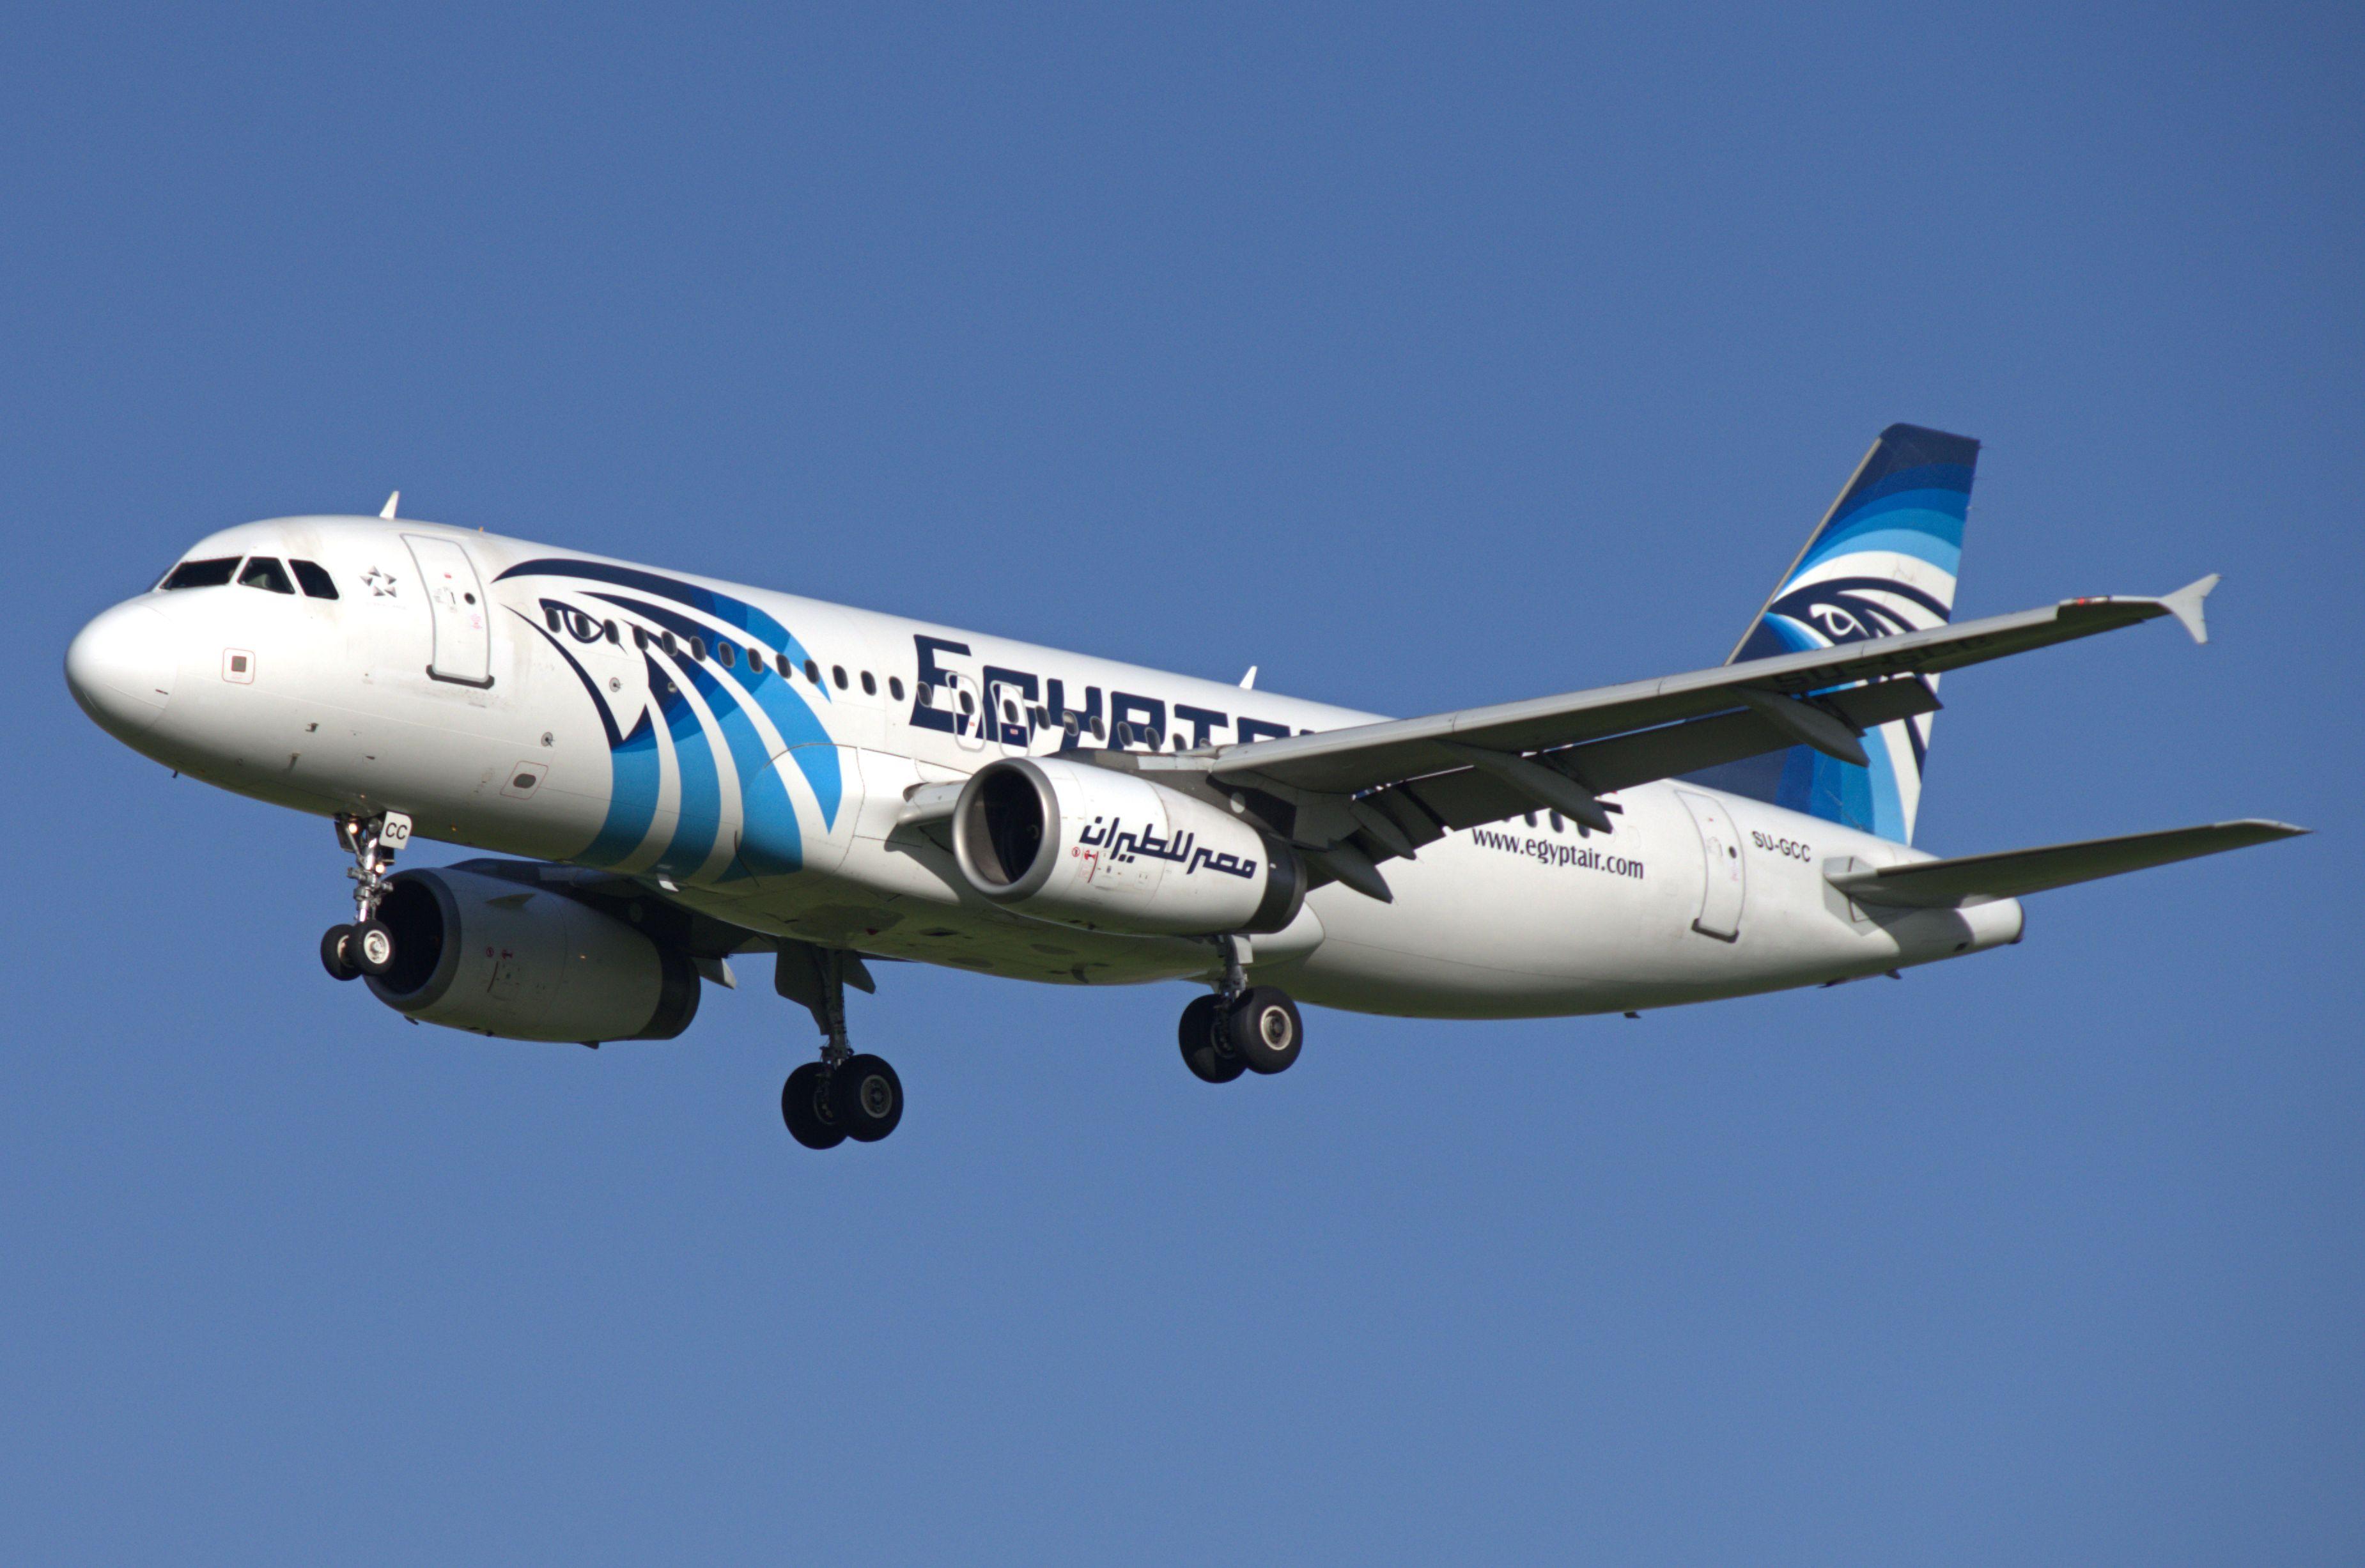 2016 05 19 - EgyptAir - 01